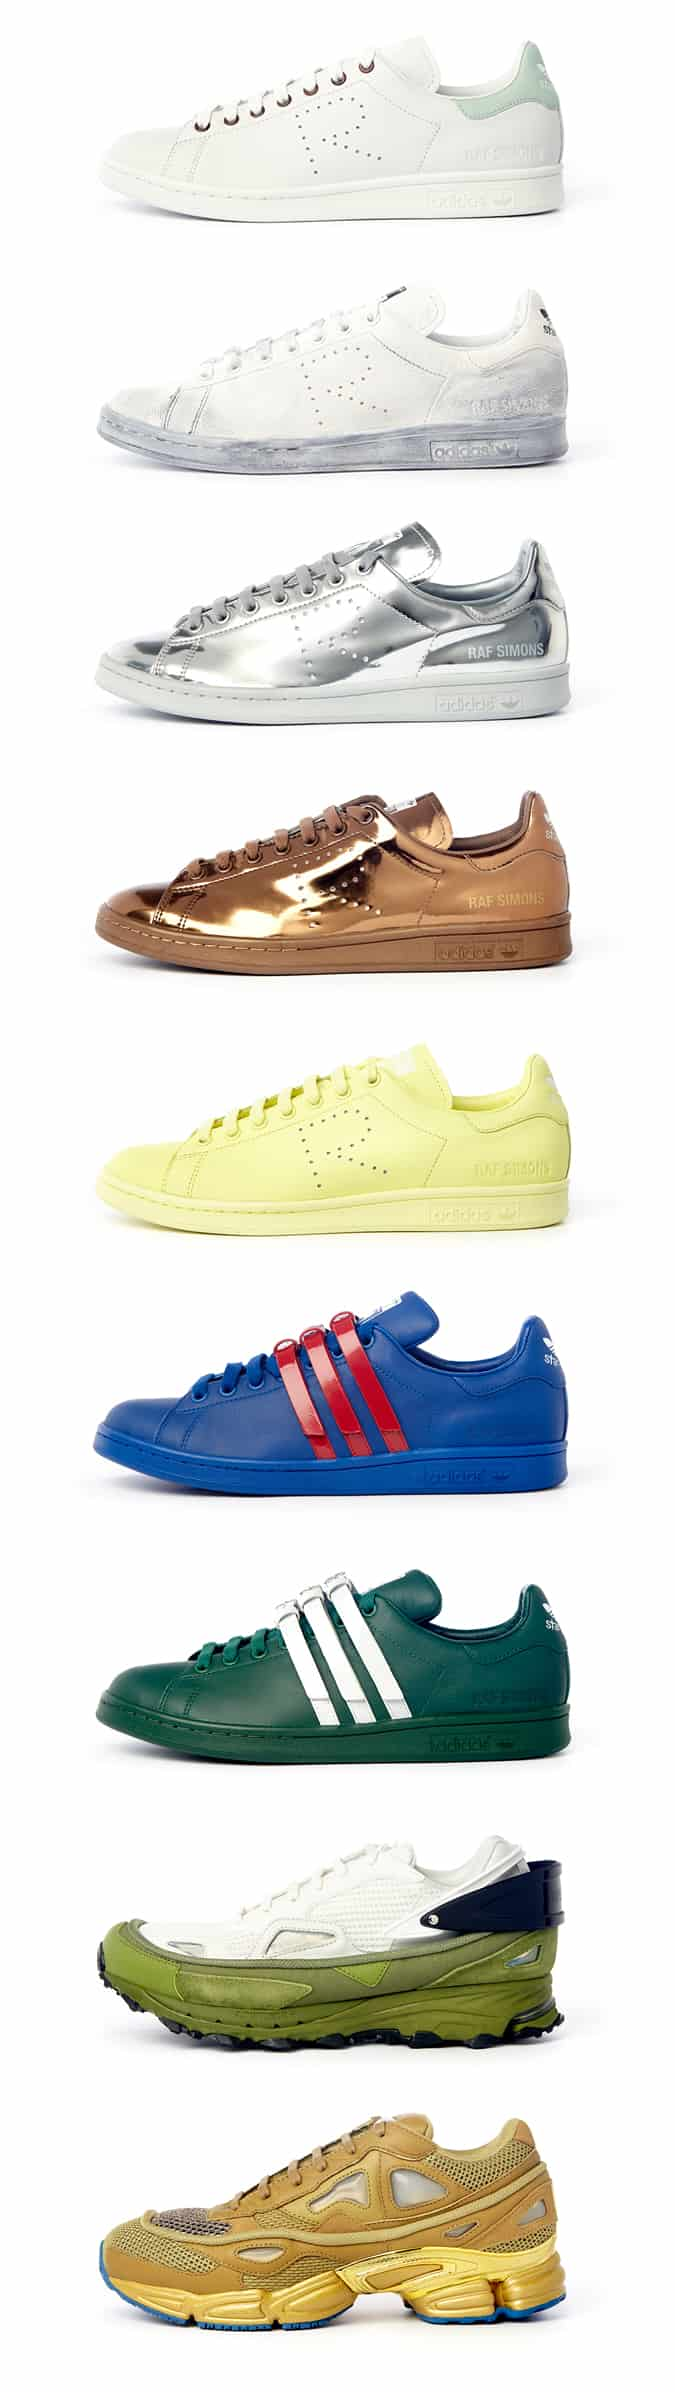 Adidas x Raf Simons Spring/Summer 2016 Collection